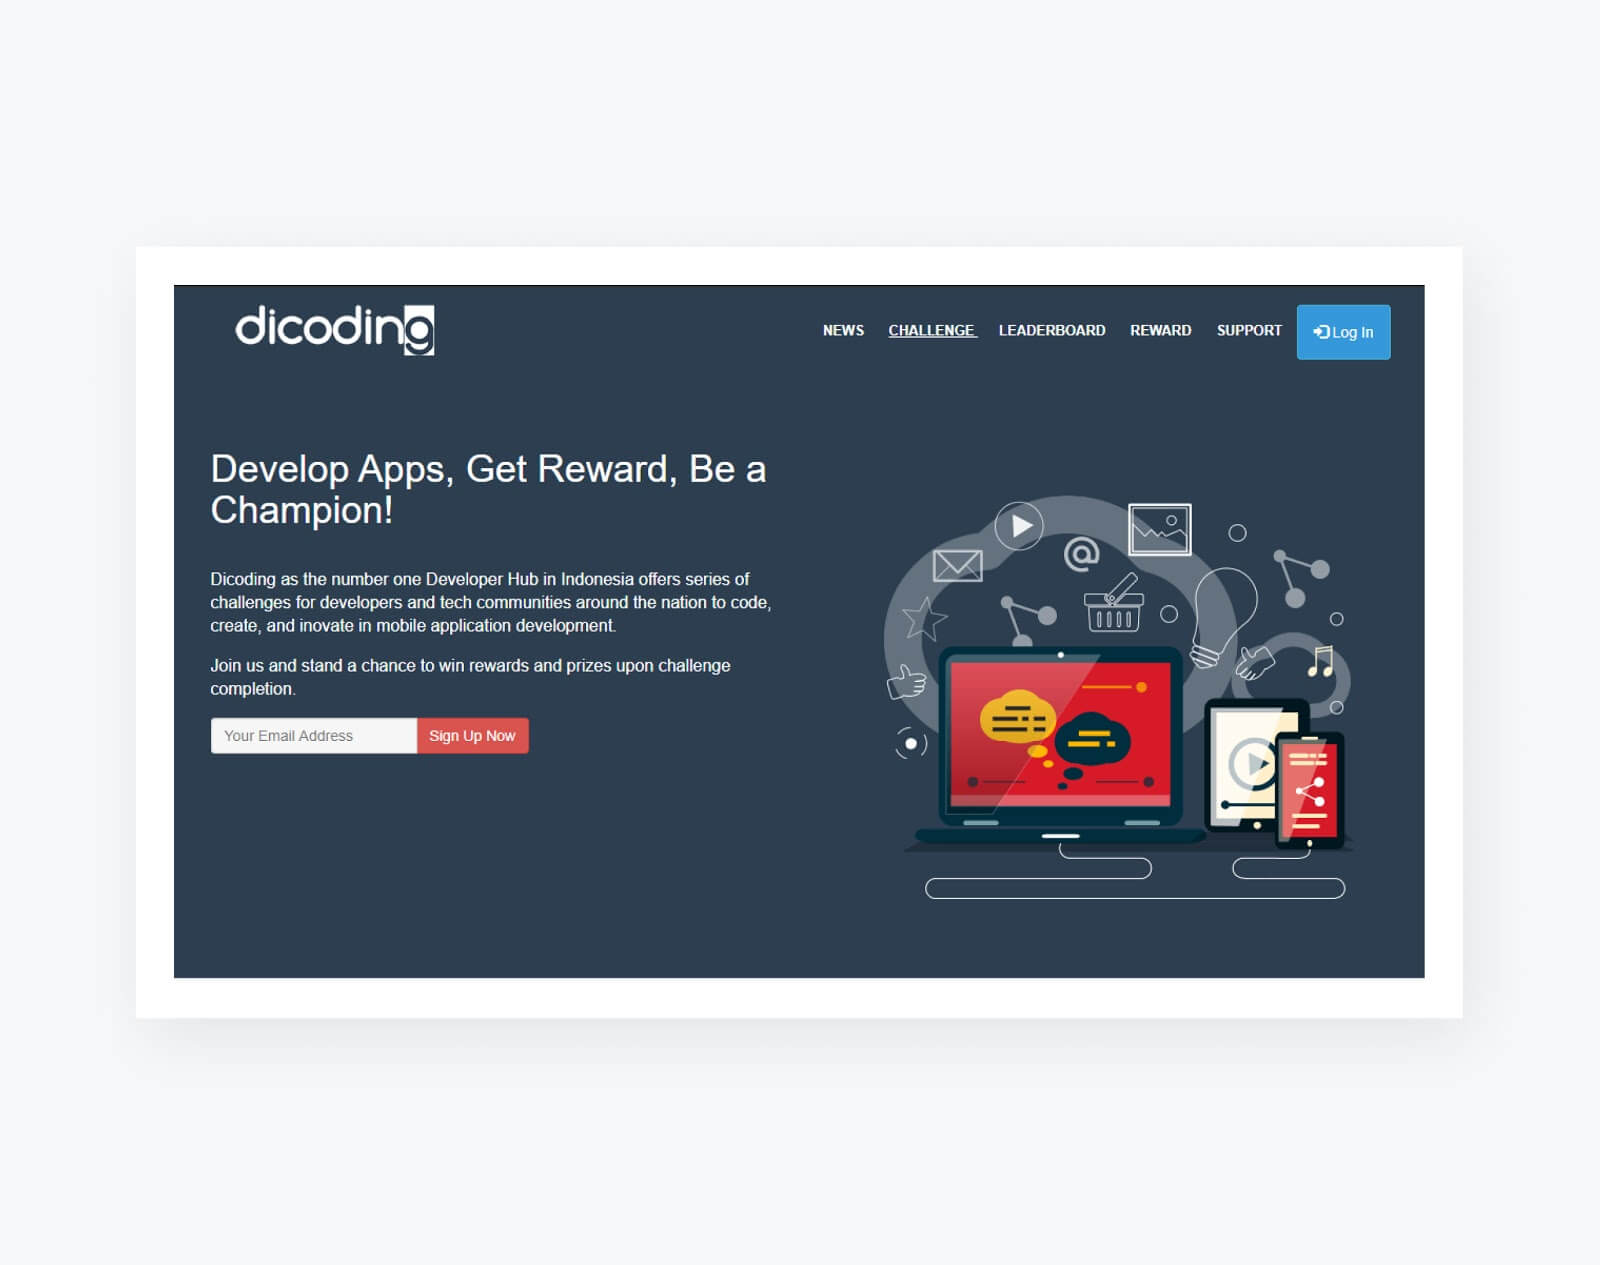 Dicoding 2015-2016